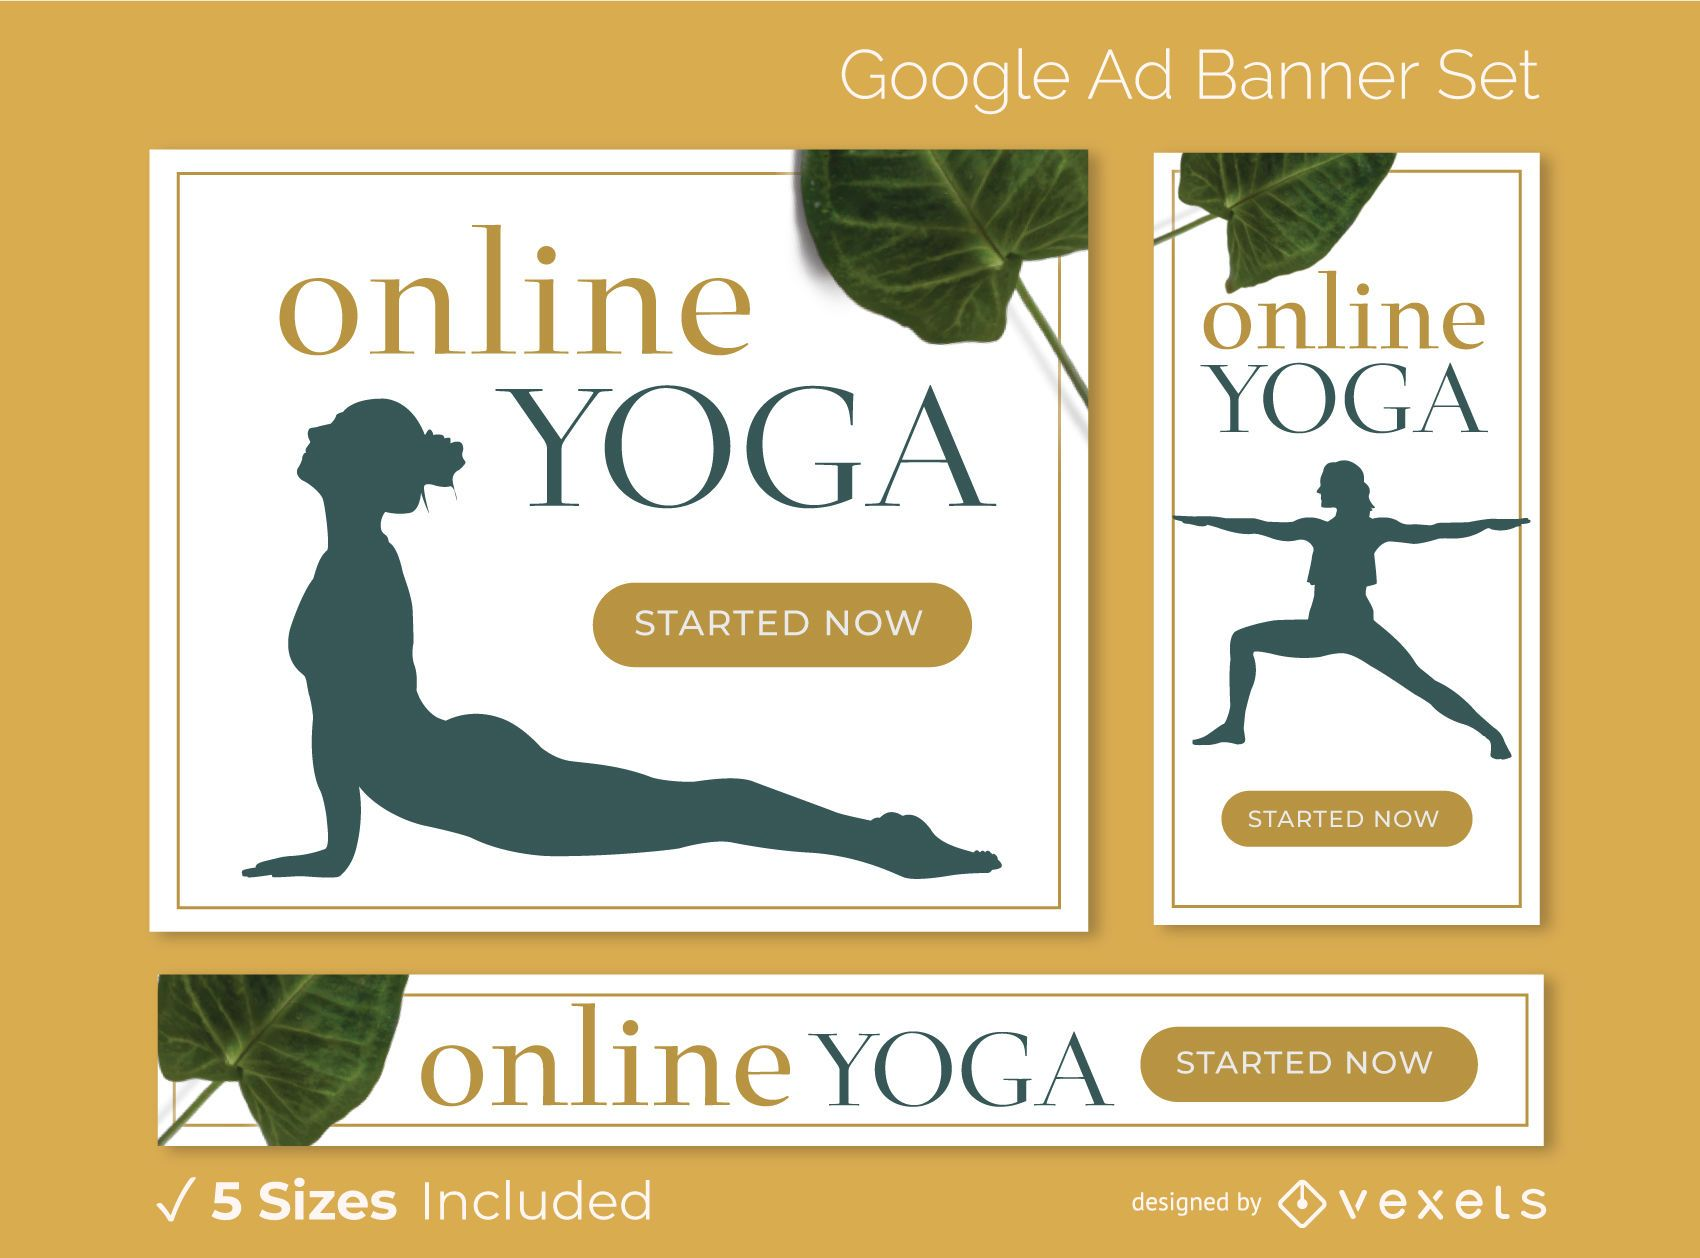 Conjunto de banners de anúncios online de ioga